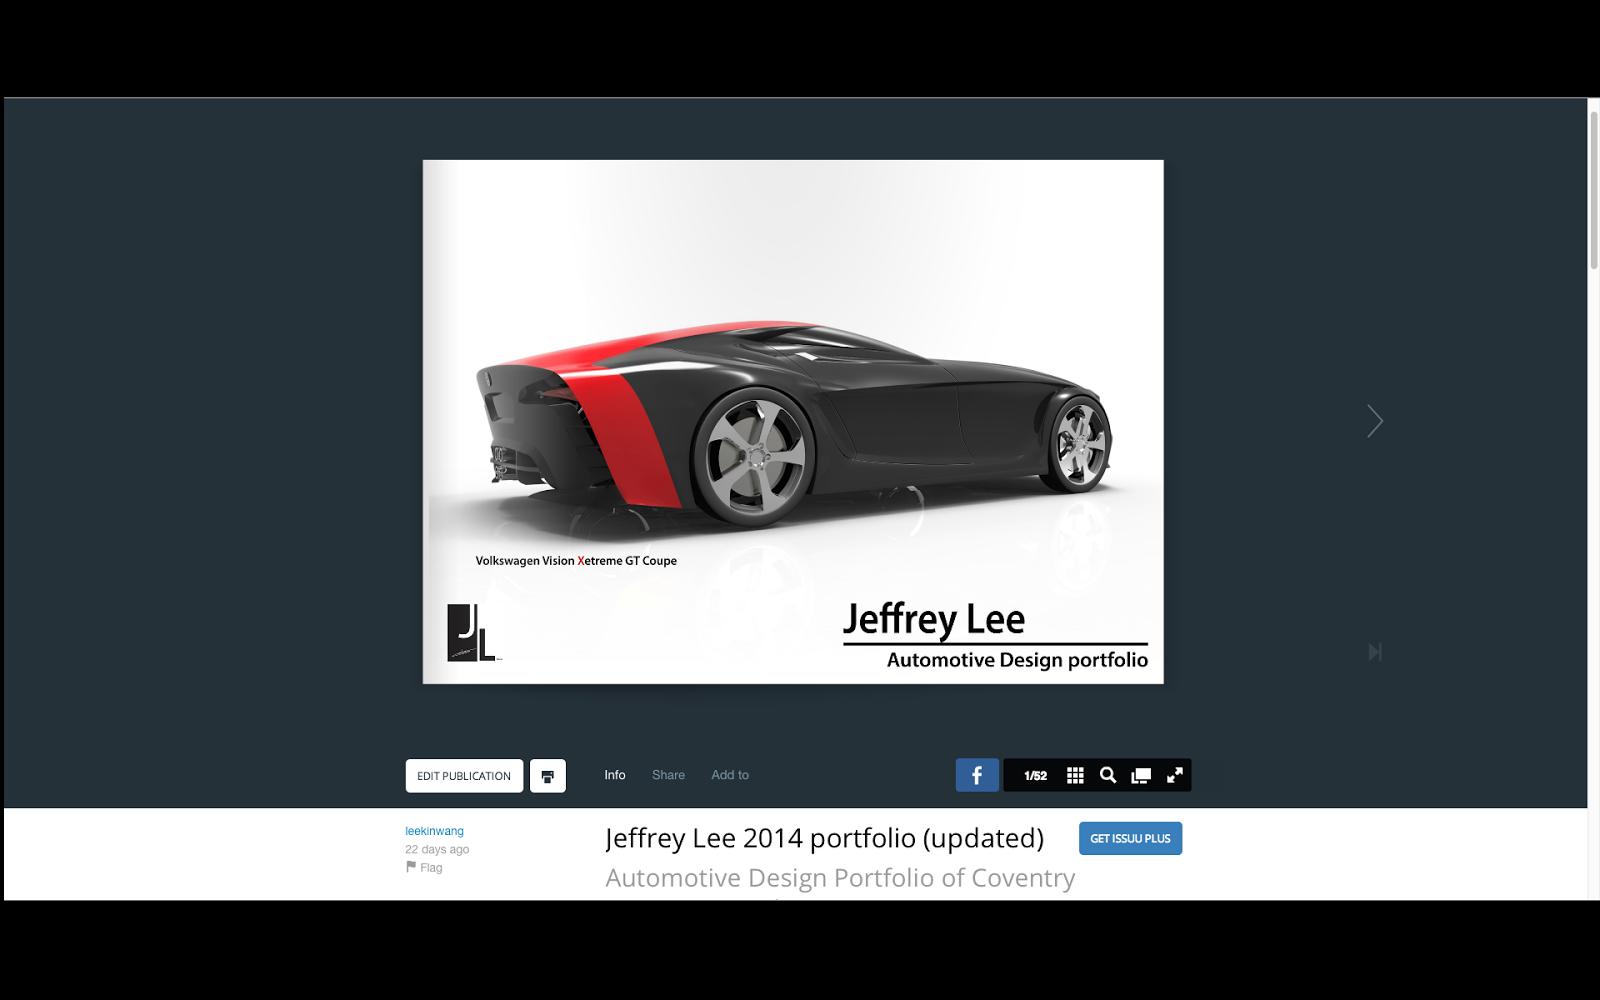 Jeffrey Lee S Car Design Automotive Design Portfolio Is On Issuu And Behance Now